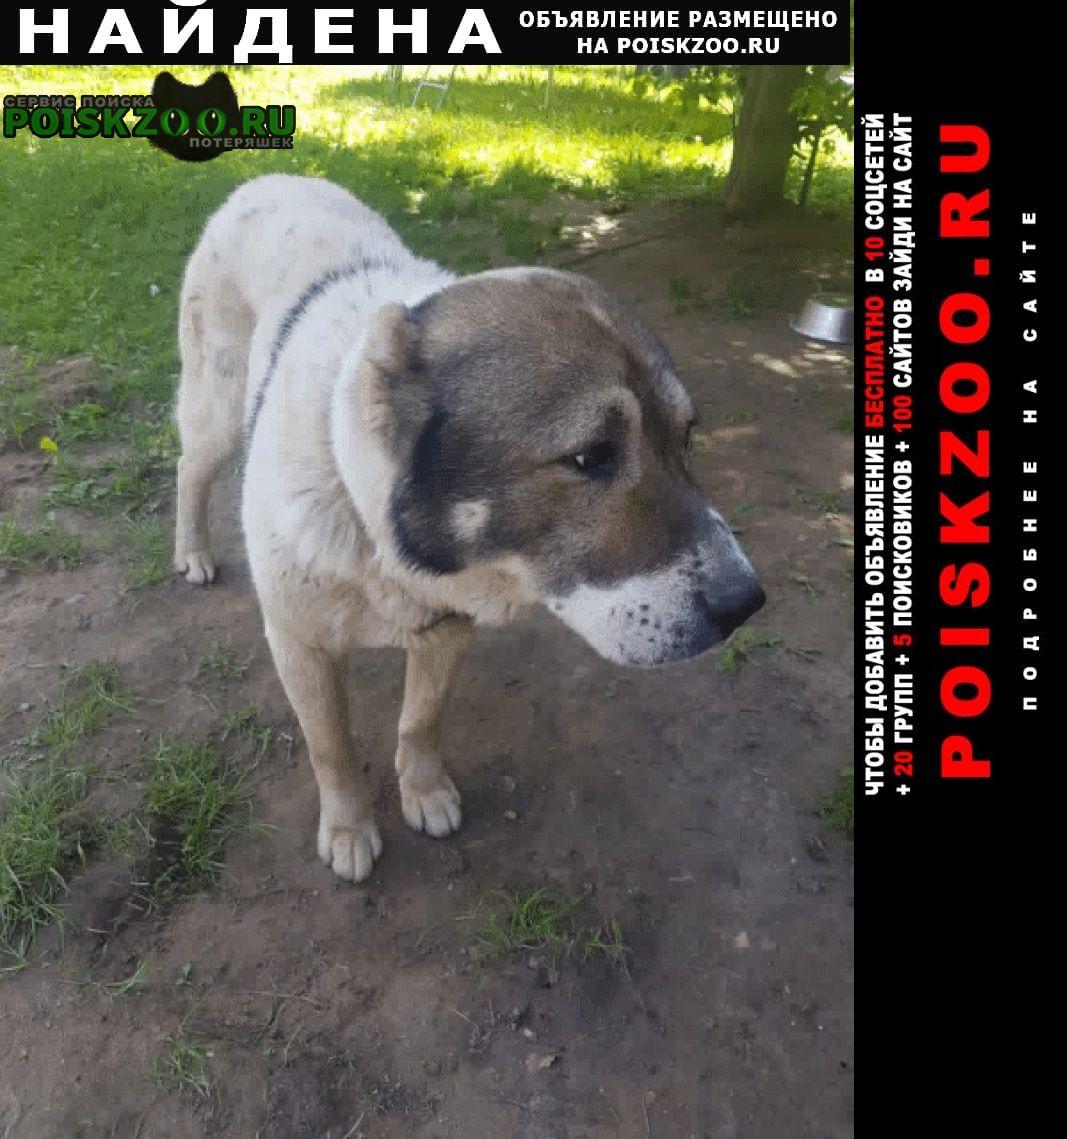 Найдена собака кобель потеряшка- щенок алабая Икша